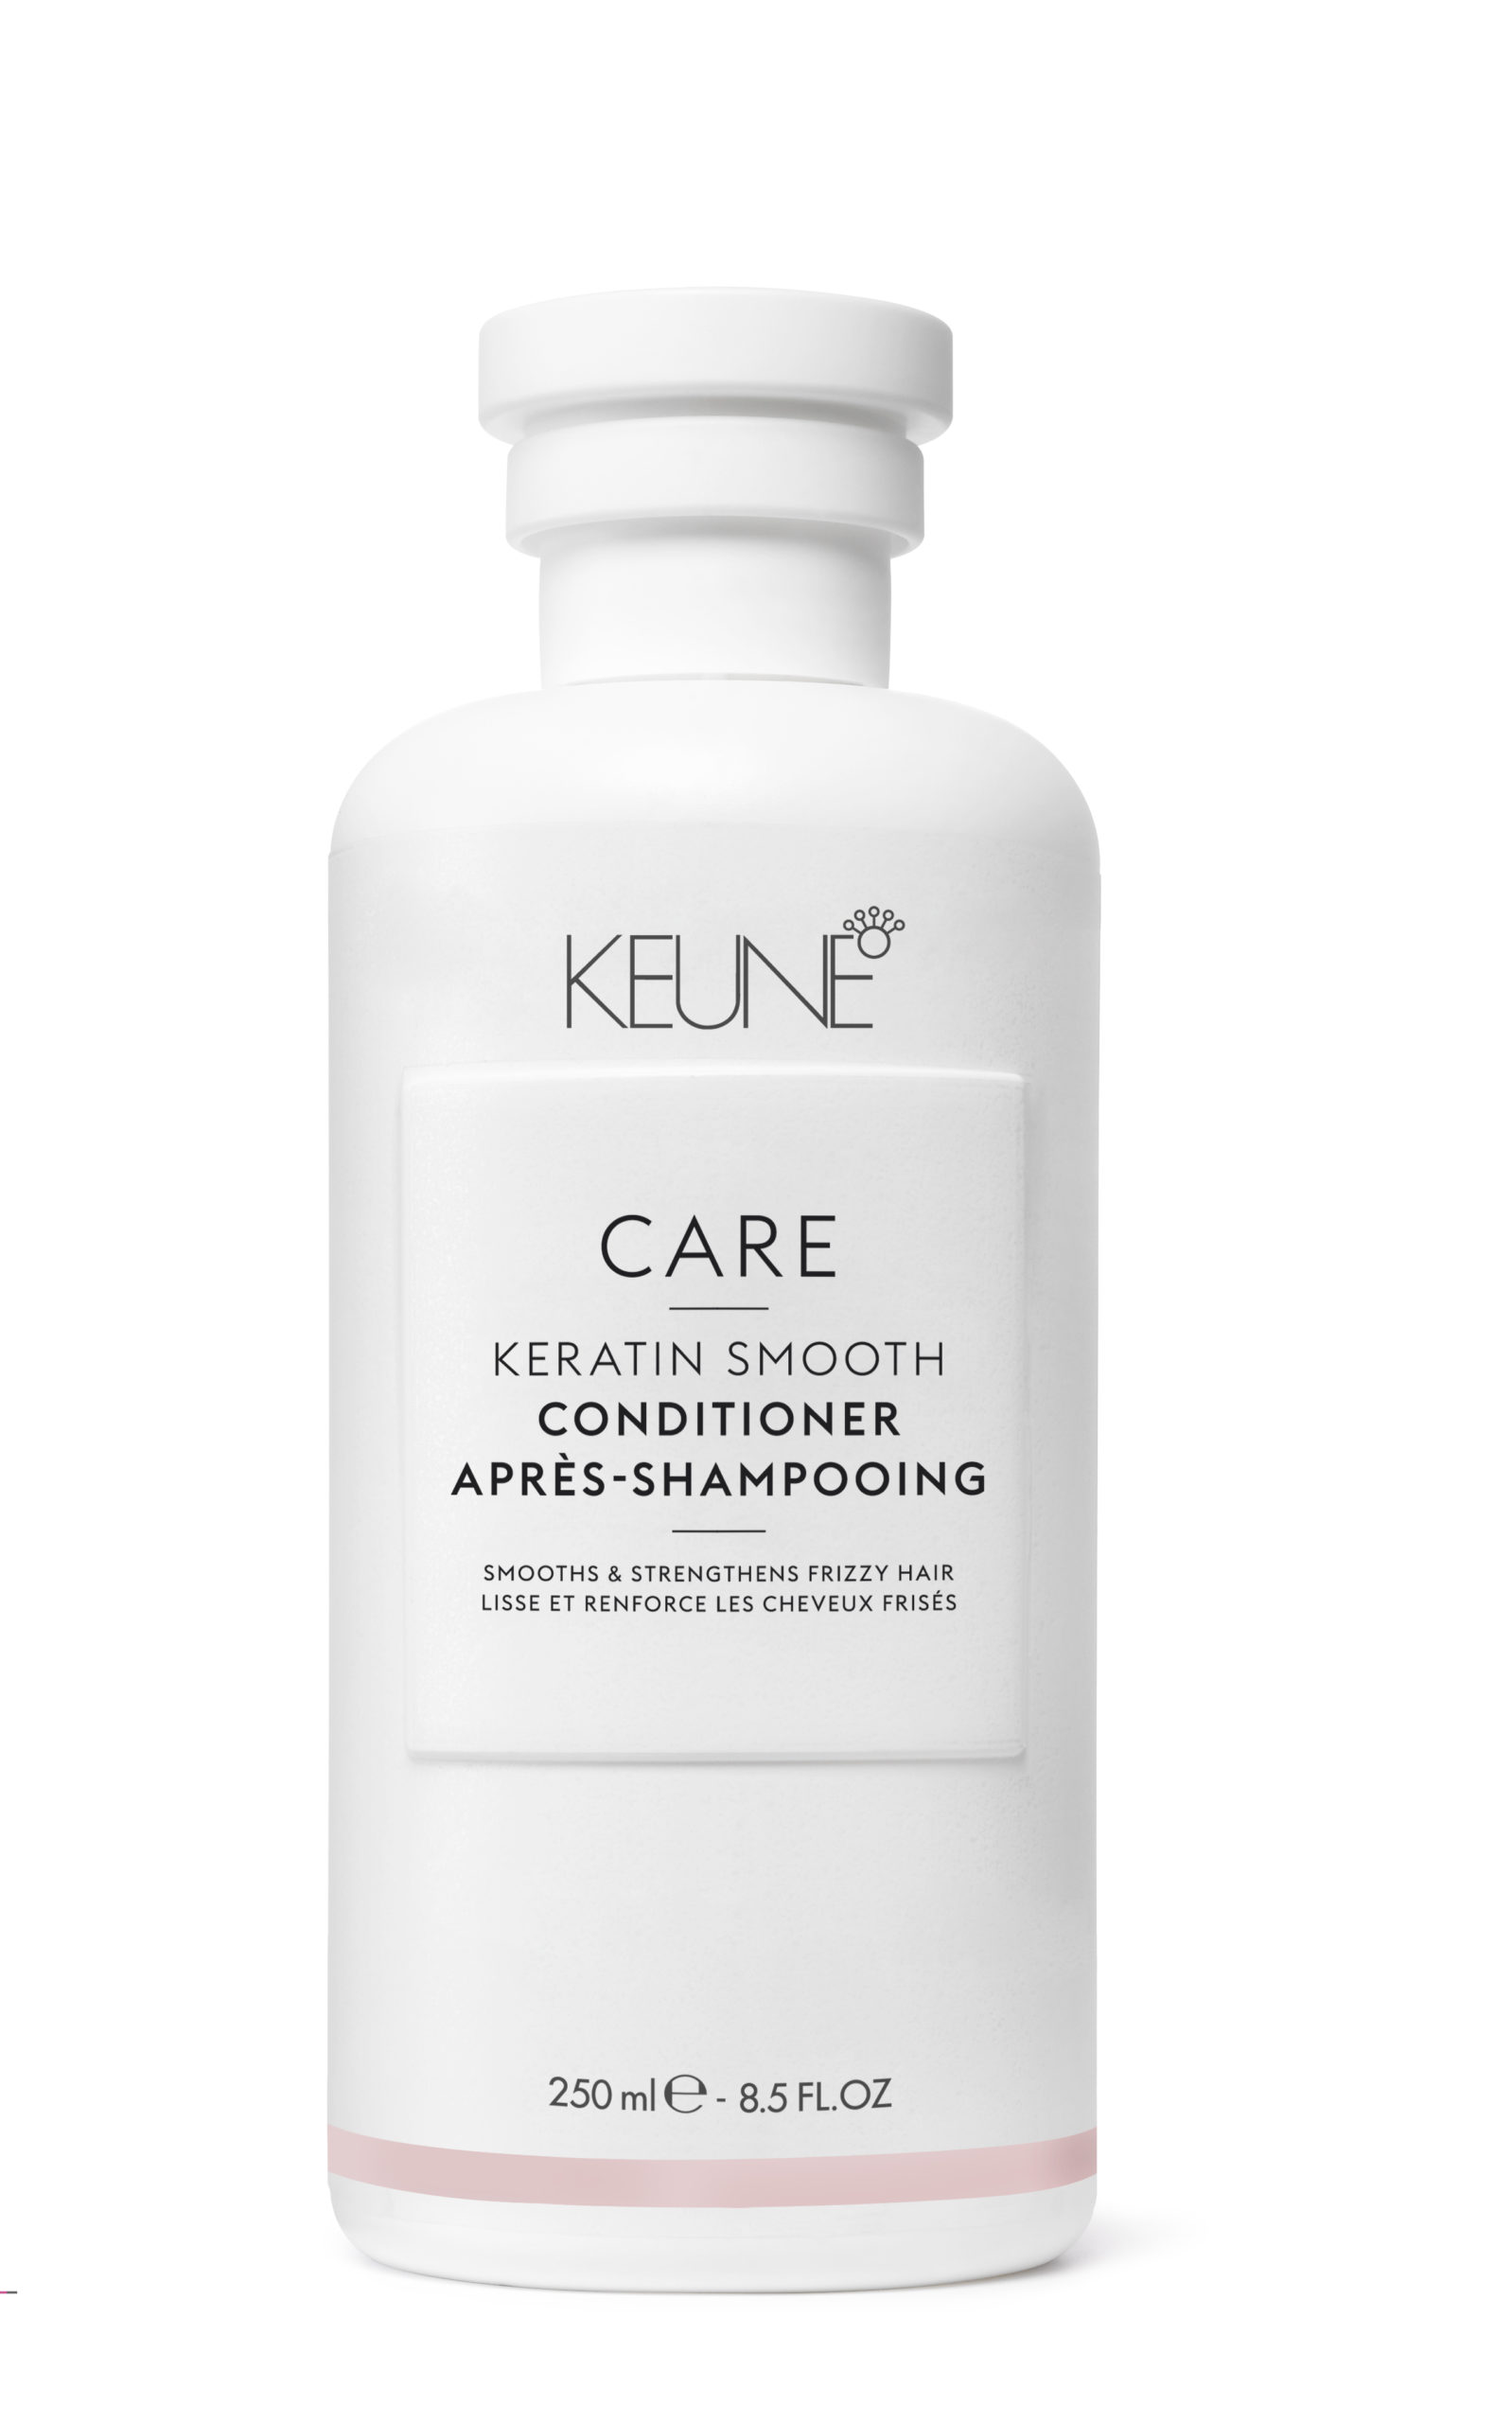 Care-Keratin-Smooth-Conditioner-250ml-def-highres